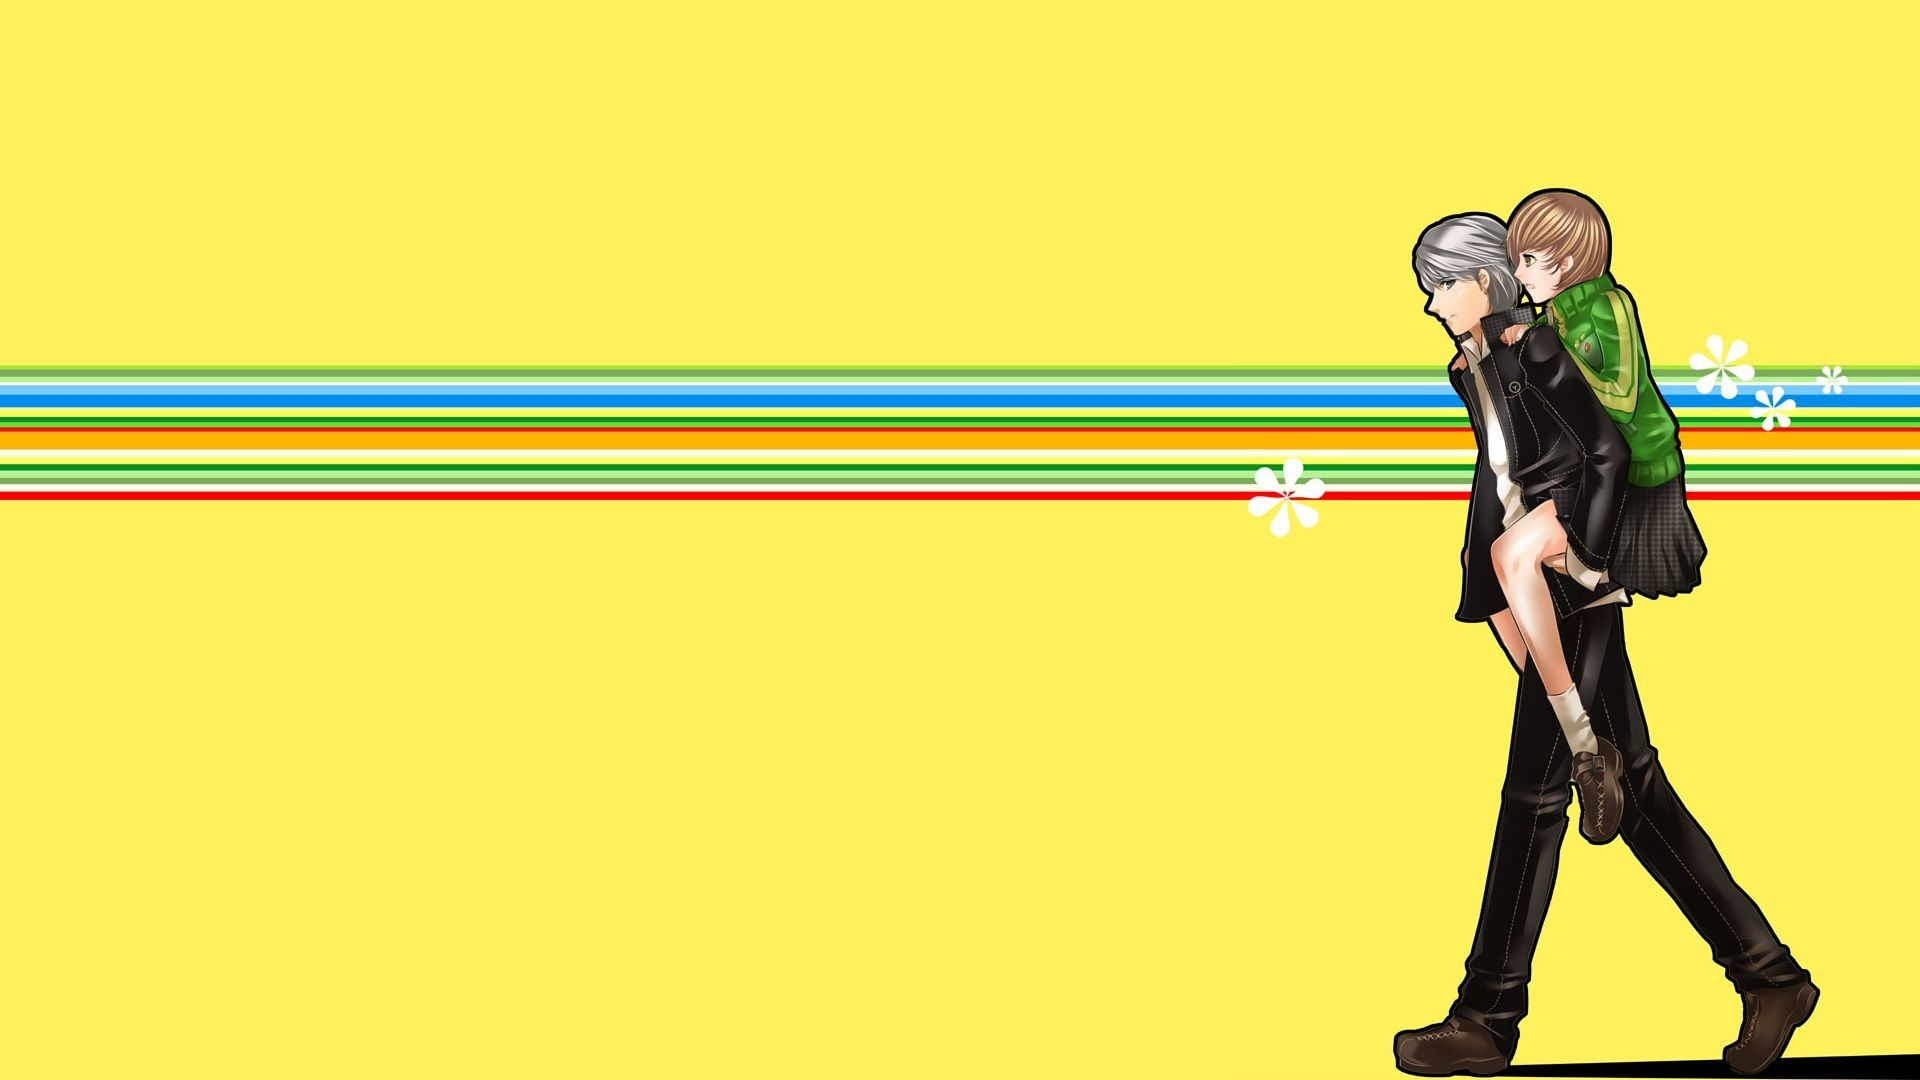 Persona 4 HD Wallpaper